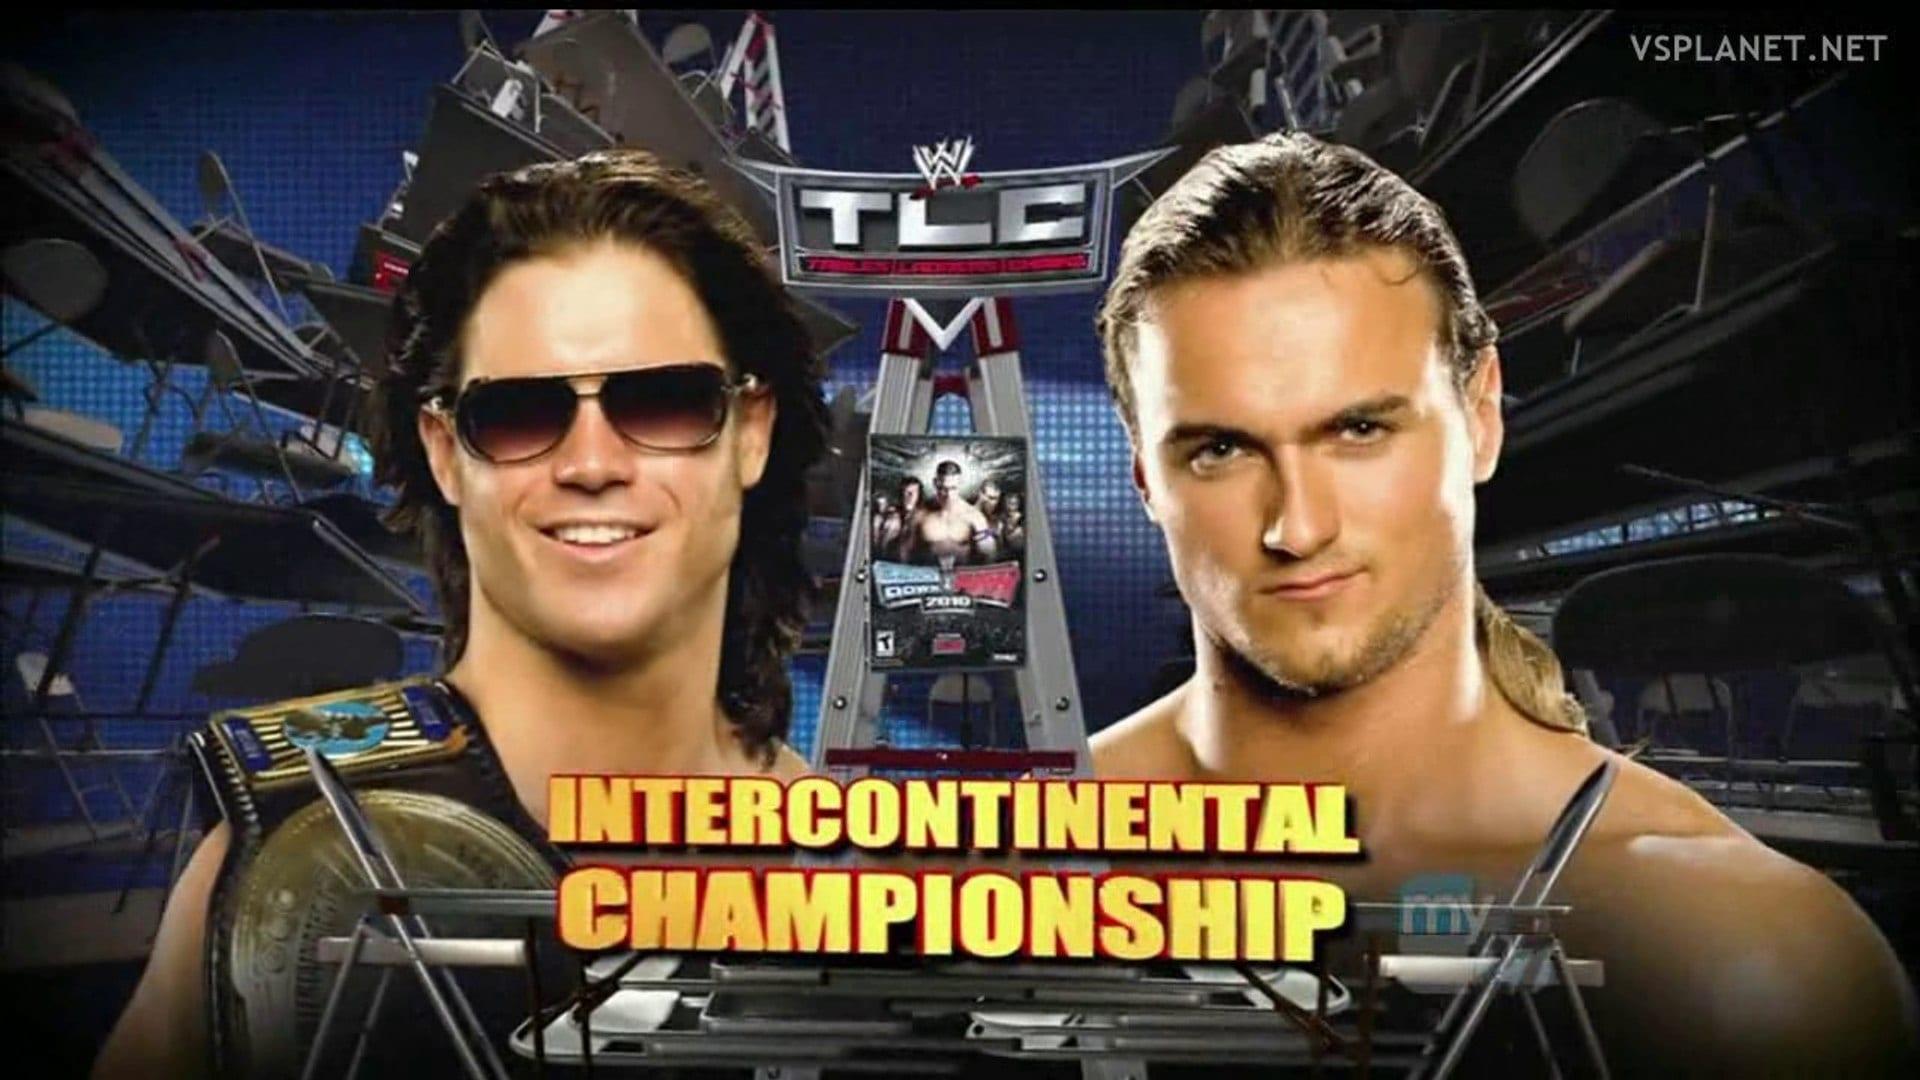 John Morrison vs Drew McIntyre - WWE TLC 2009